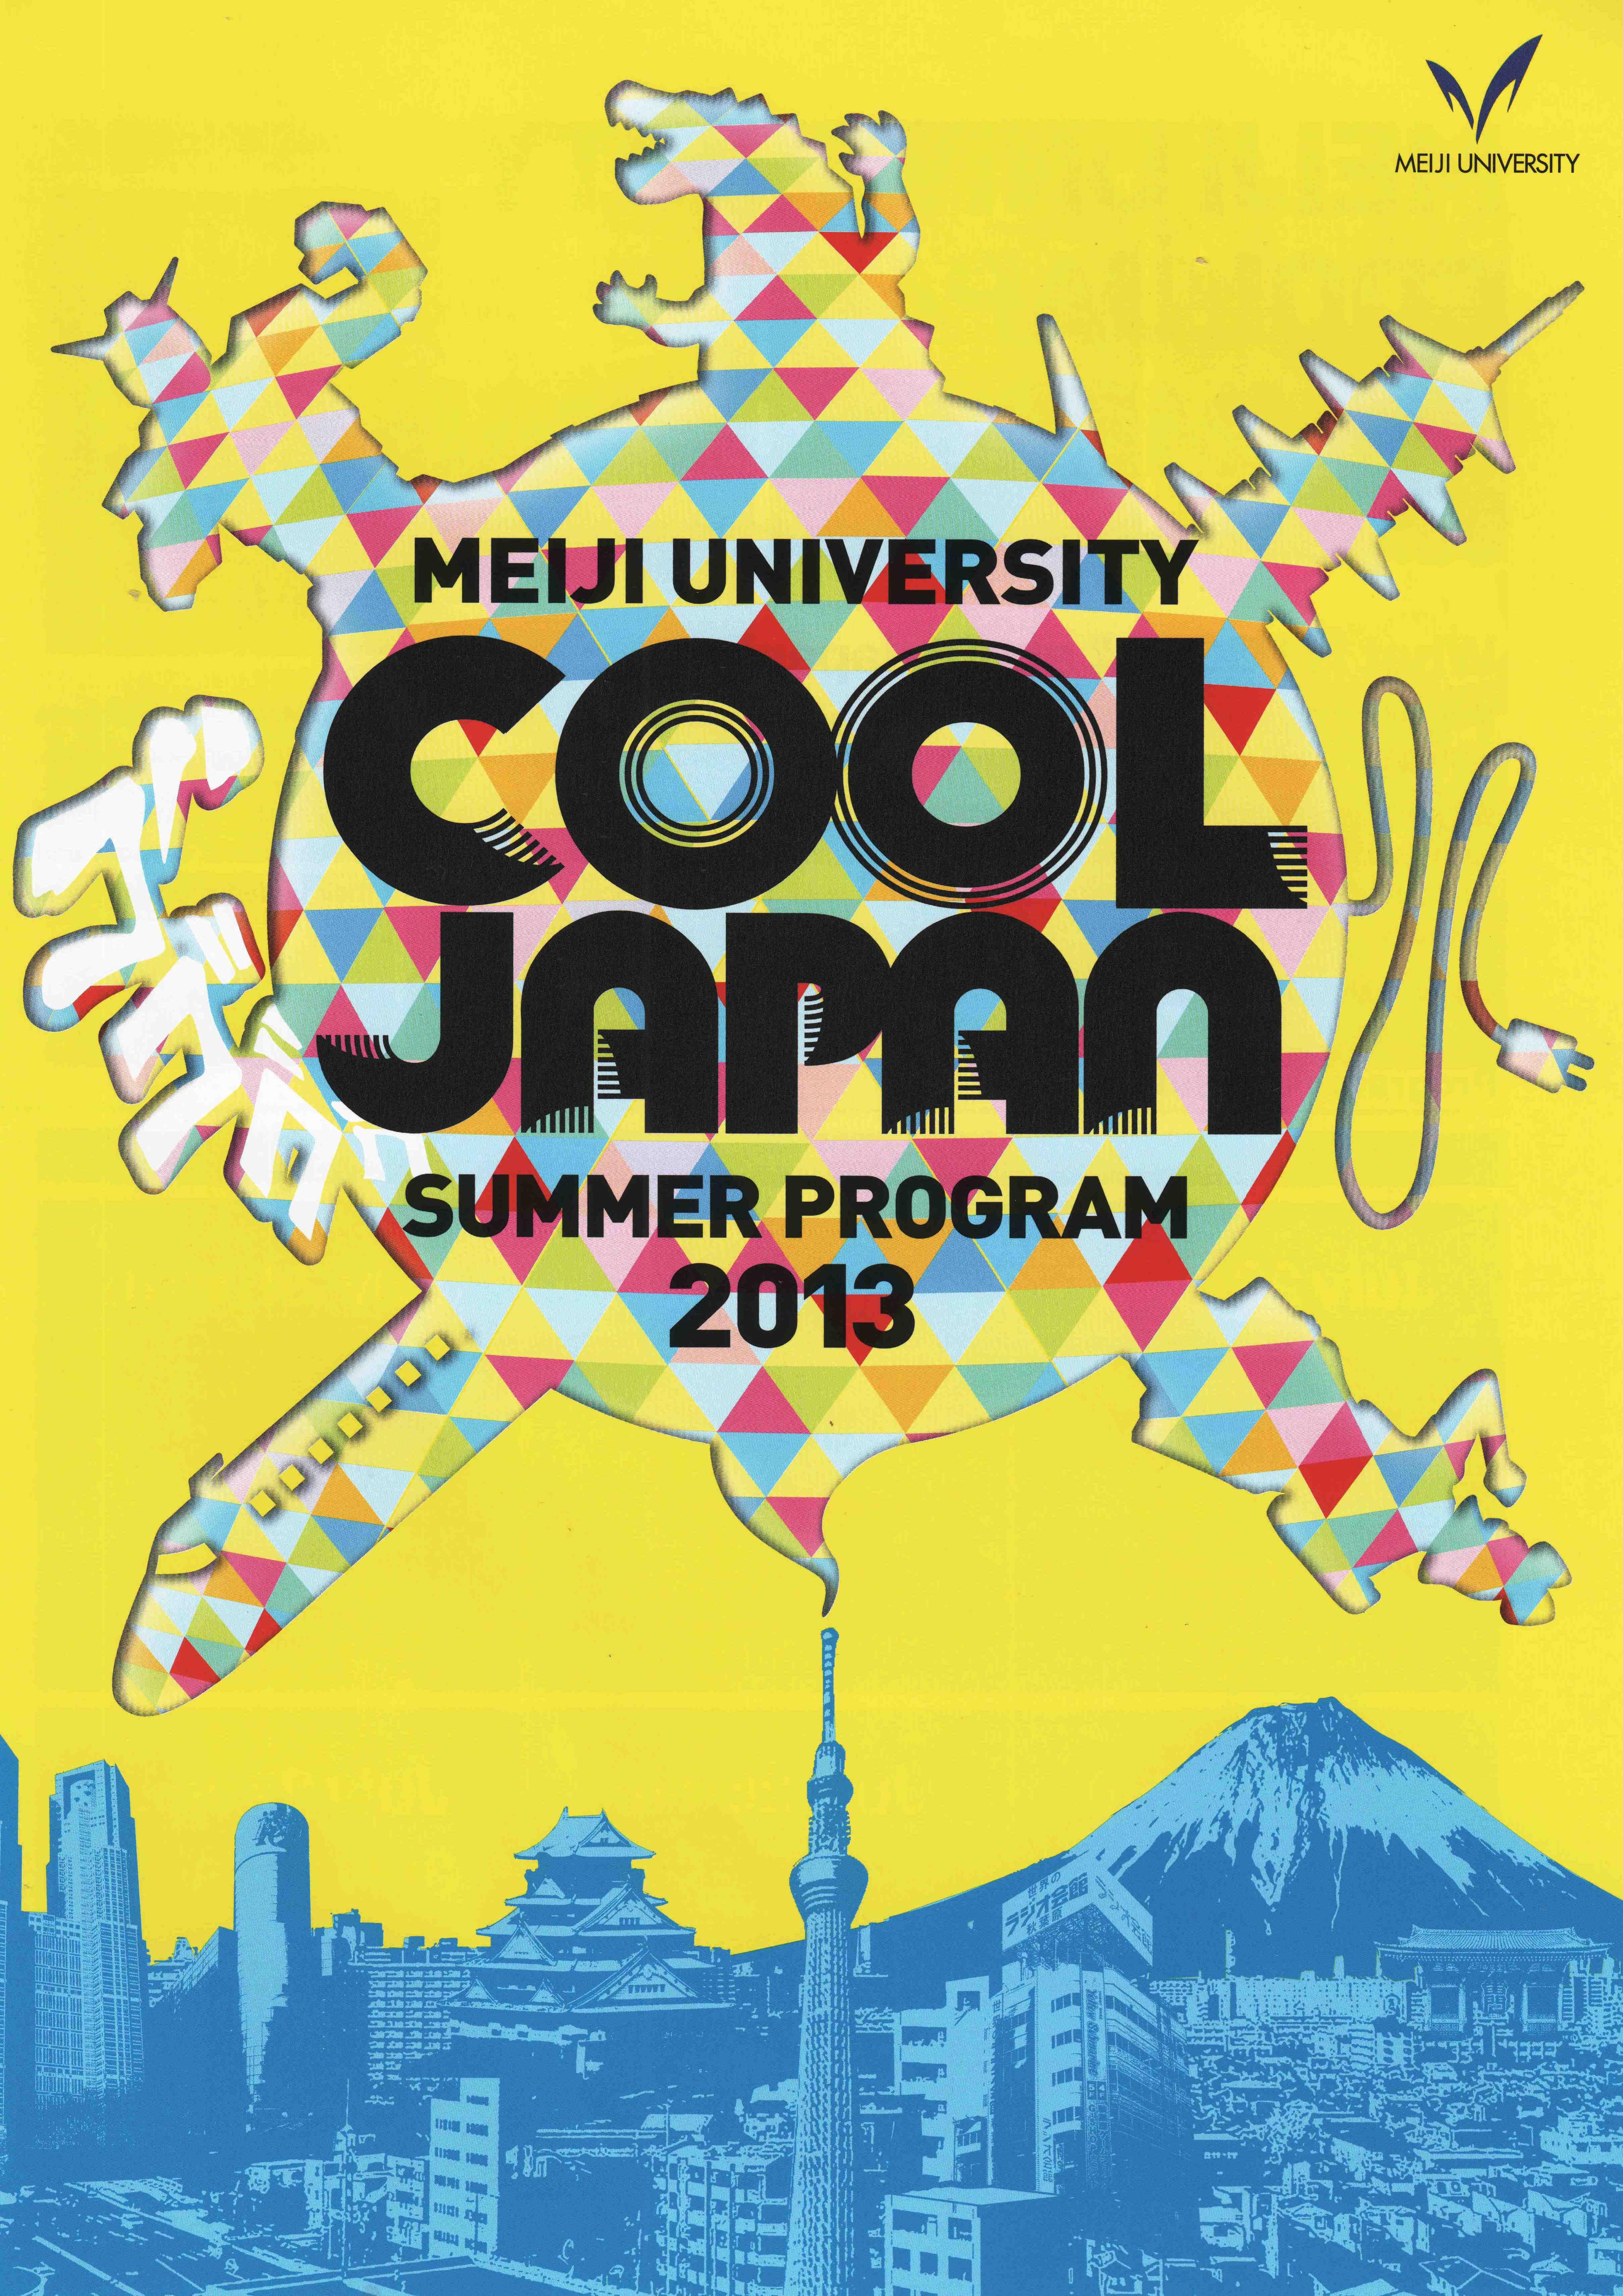 ProgramRegistration Summer Japan Open институт Cool Is Now KJcl3TF1u